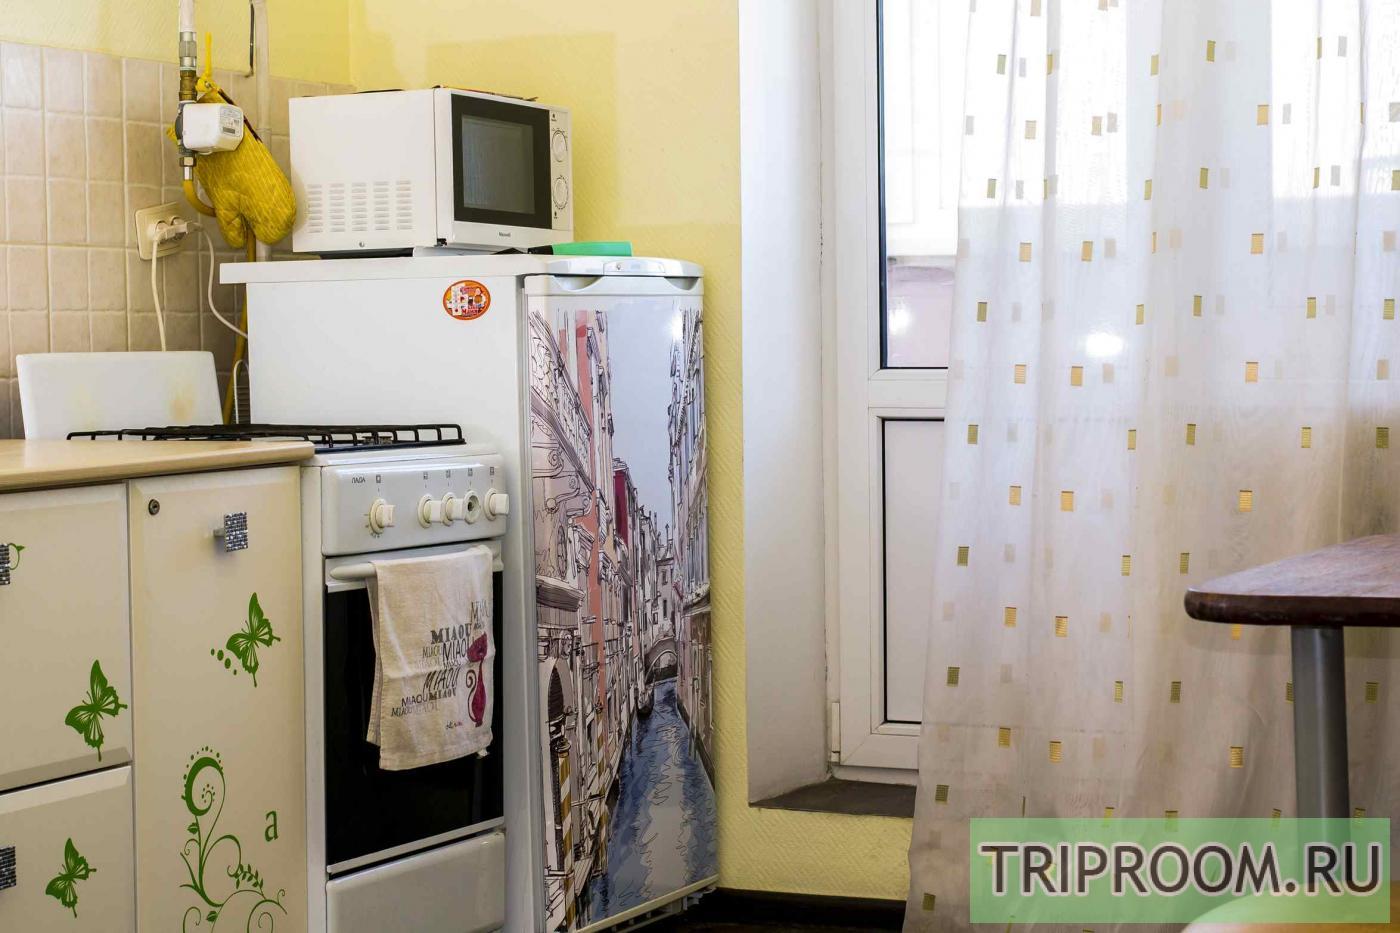 1-комнатная квартира посуточно (вариант № 14713), ул. Петра Смородина улица, фото № 17